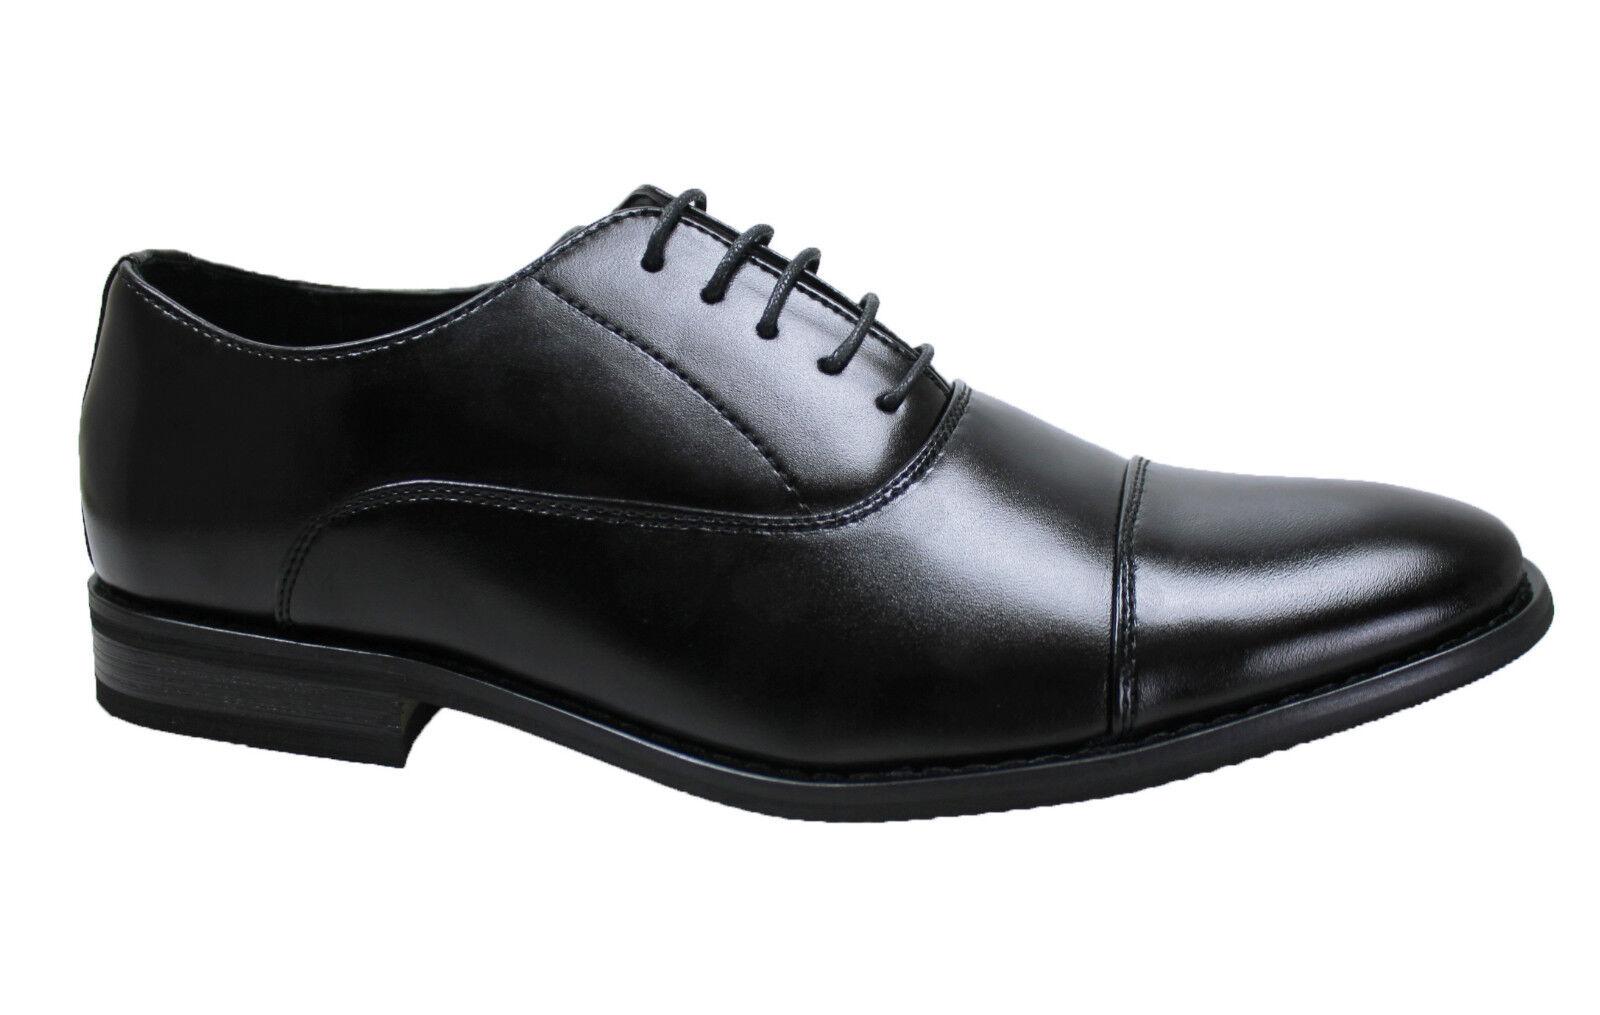 shoes CALZADO HOMBRE DIAMANTE CLÁSICO ELEGANTES black CHAROL 40 41 42 43 44 45